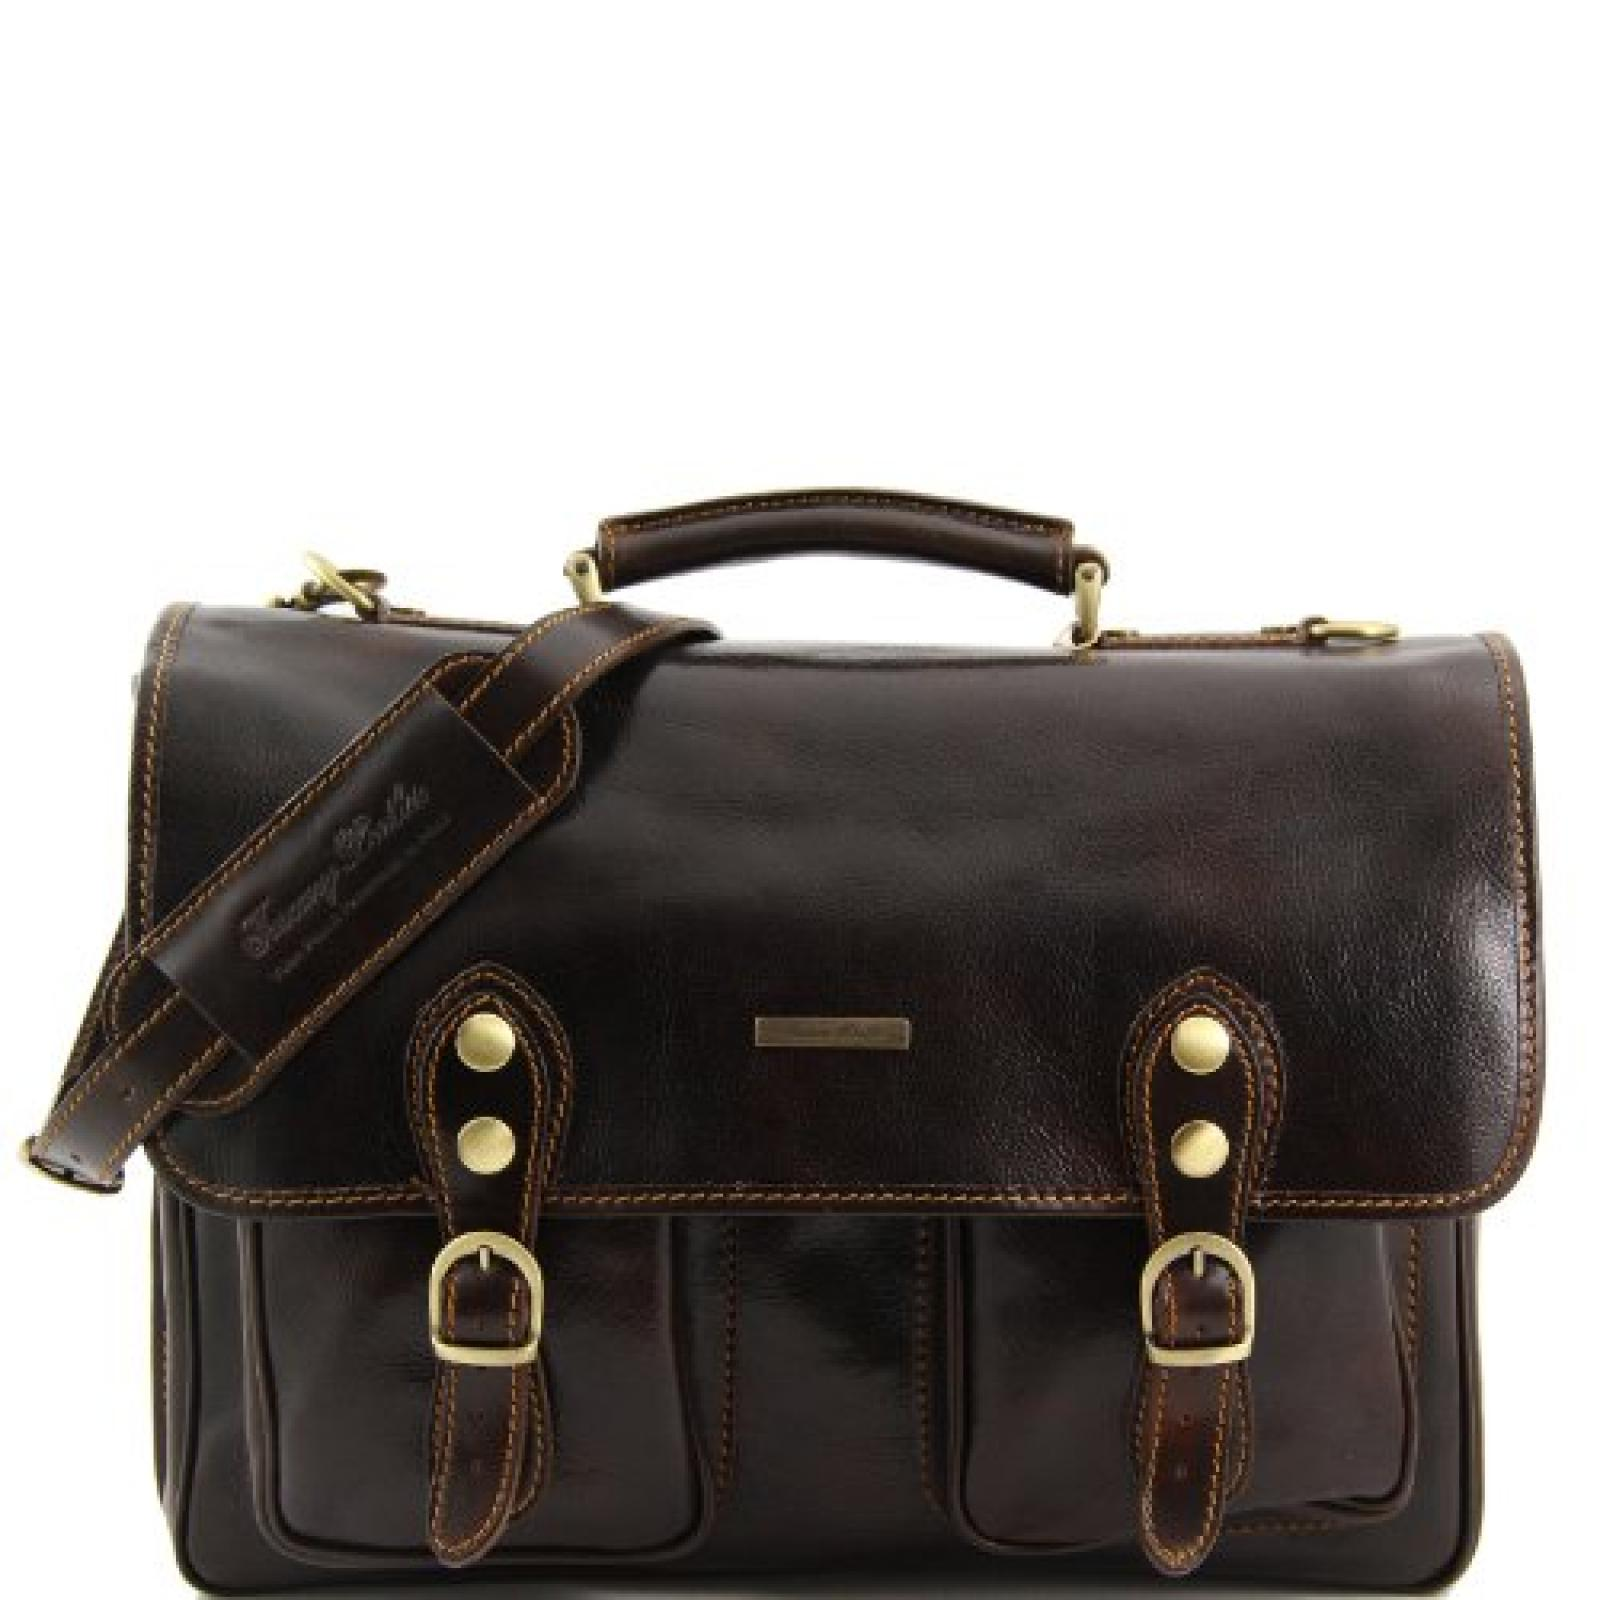 81003104 - TUSCANY LEATHER: MODENA - Messenger Tasche aus Leder, dunkelbraun